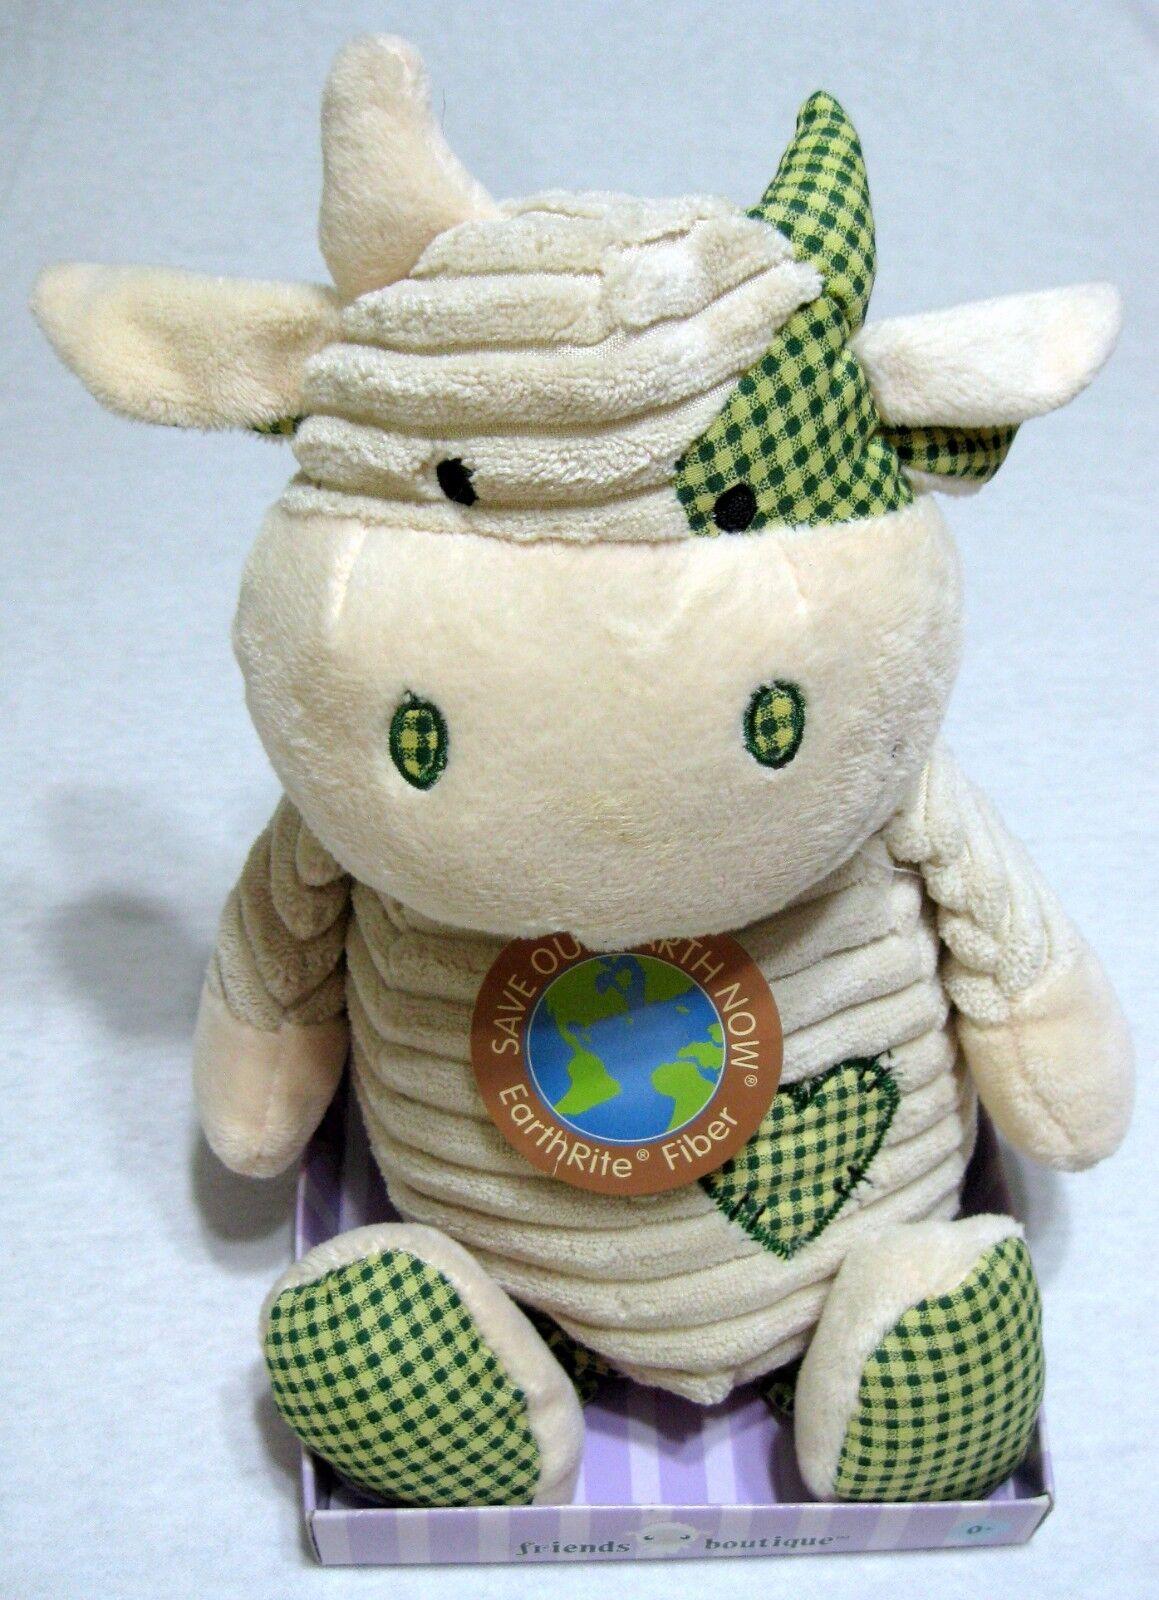 Friends Boutique Cow Plush Stuffed Animal